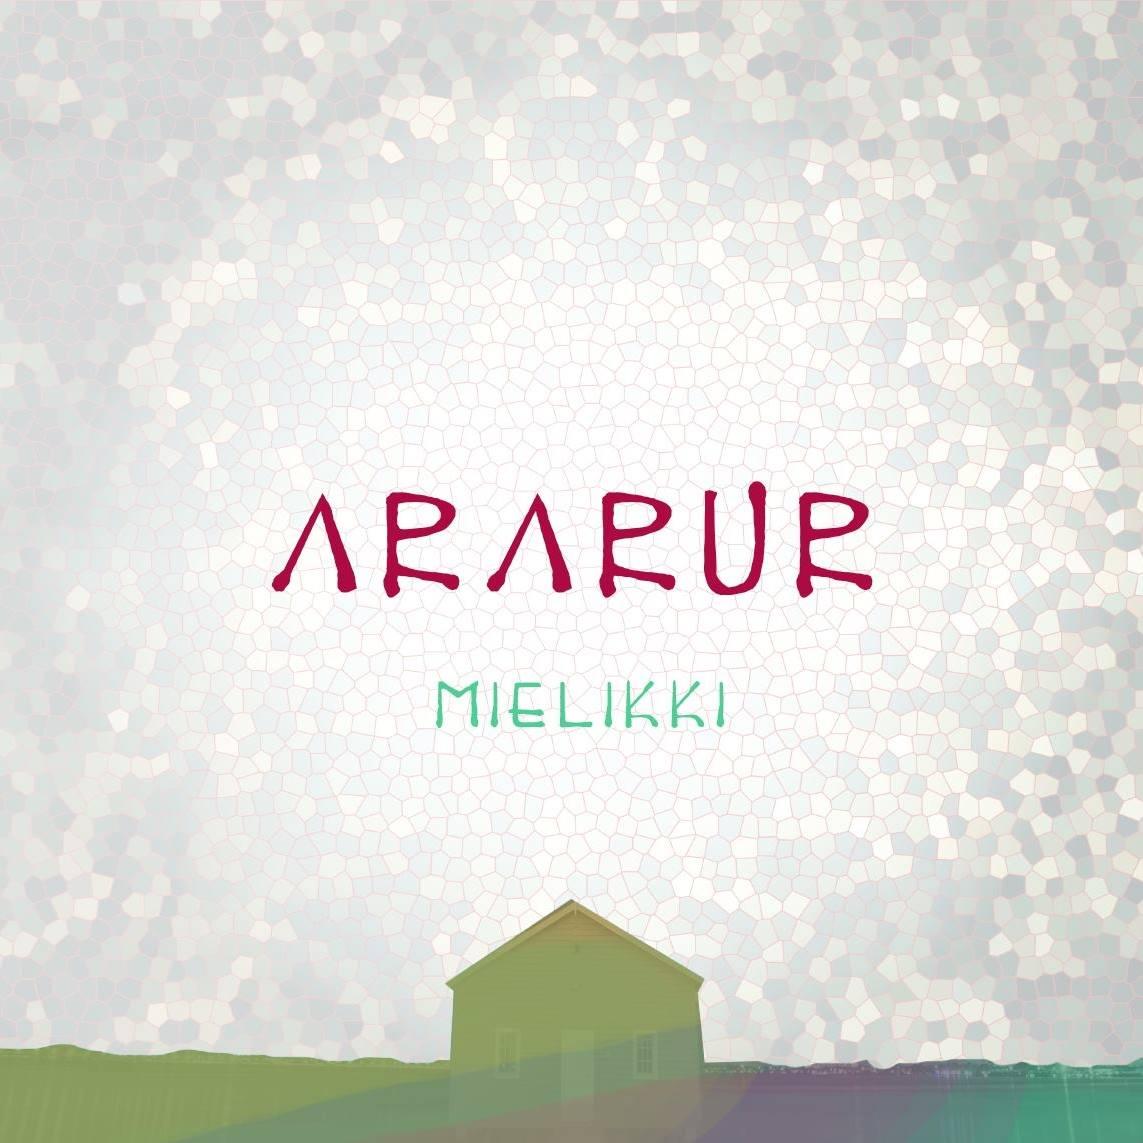 Mielikki de Ararur